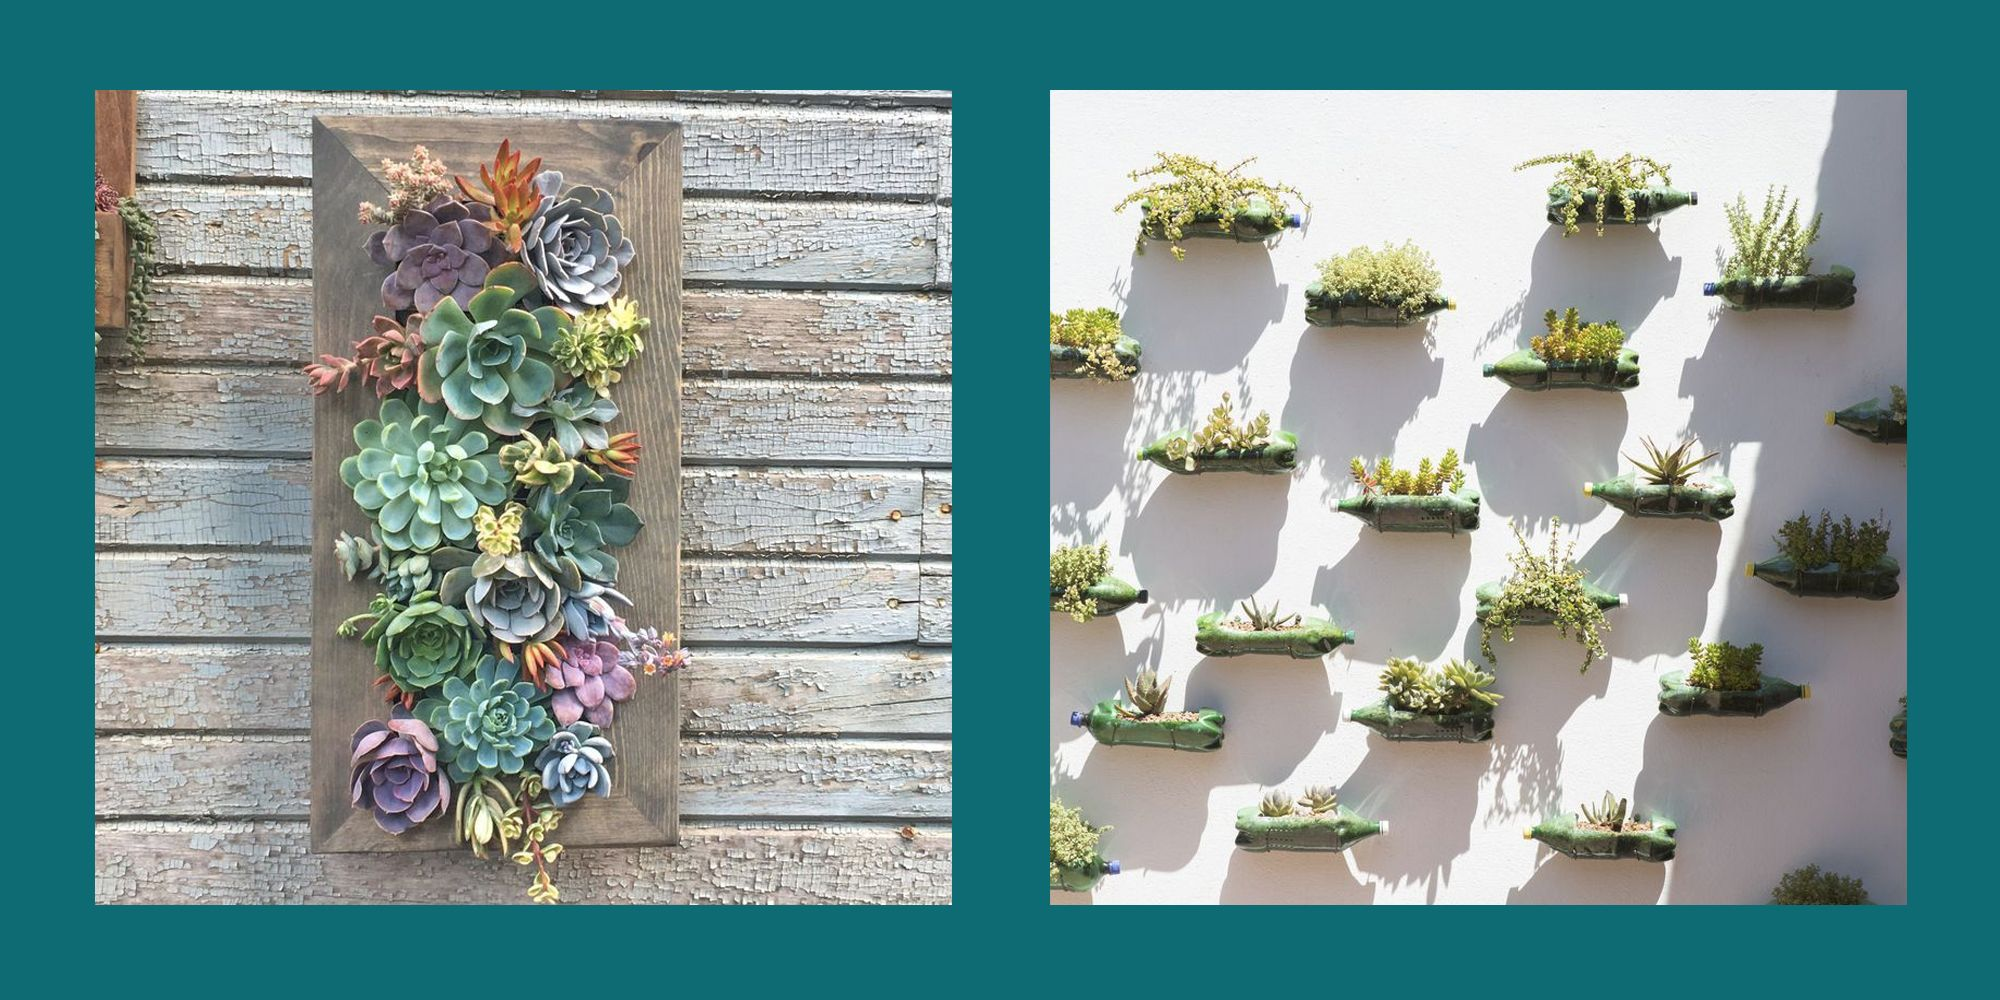 20 Brilliant Vertical Garden Ideas Interesting Vertical Garden Planters